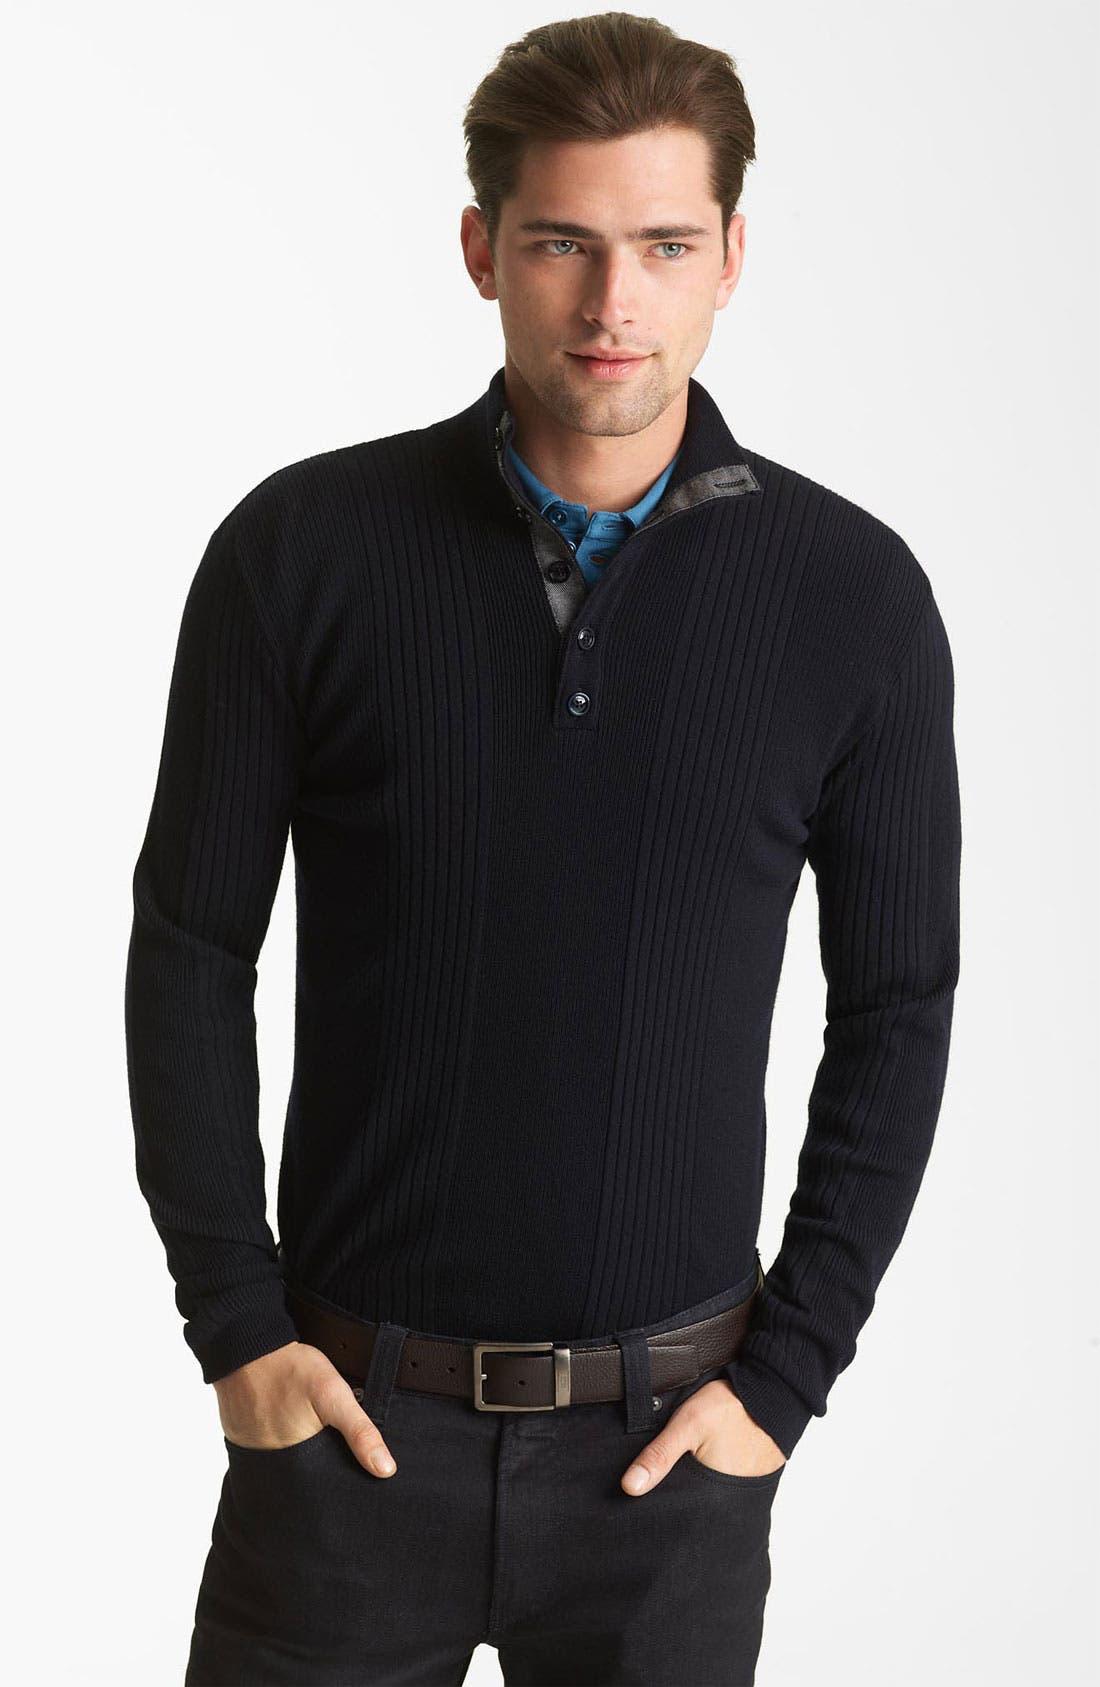 Alternate Image 1 Selected - Armani Collezioni Rib Knit Mock Neck Sweater